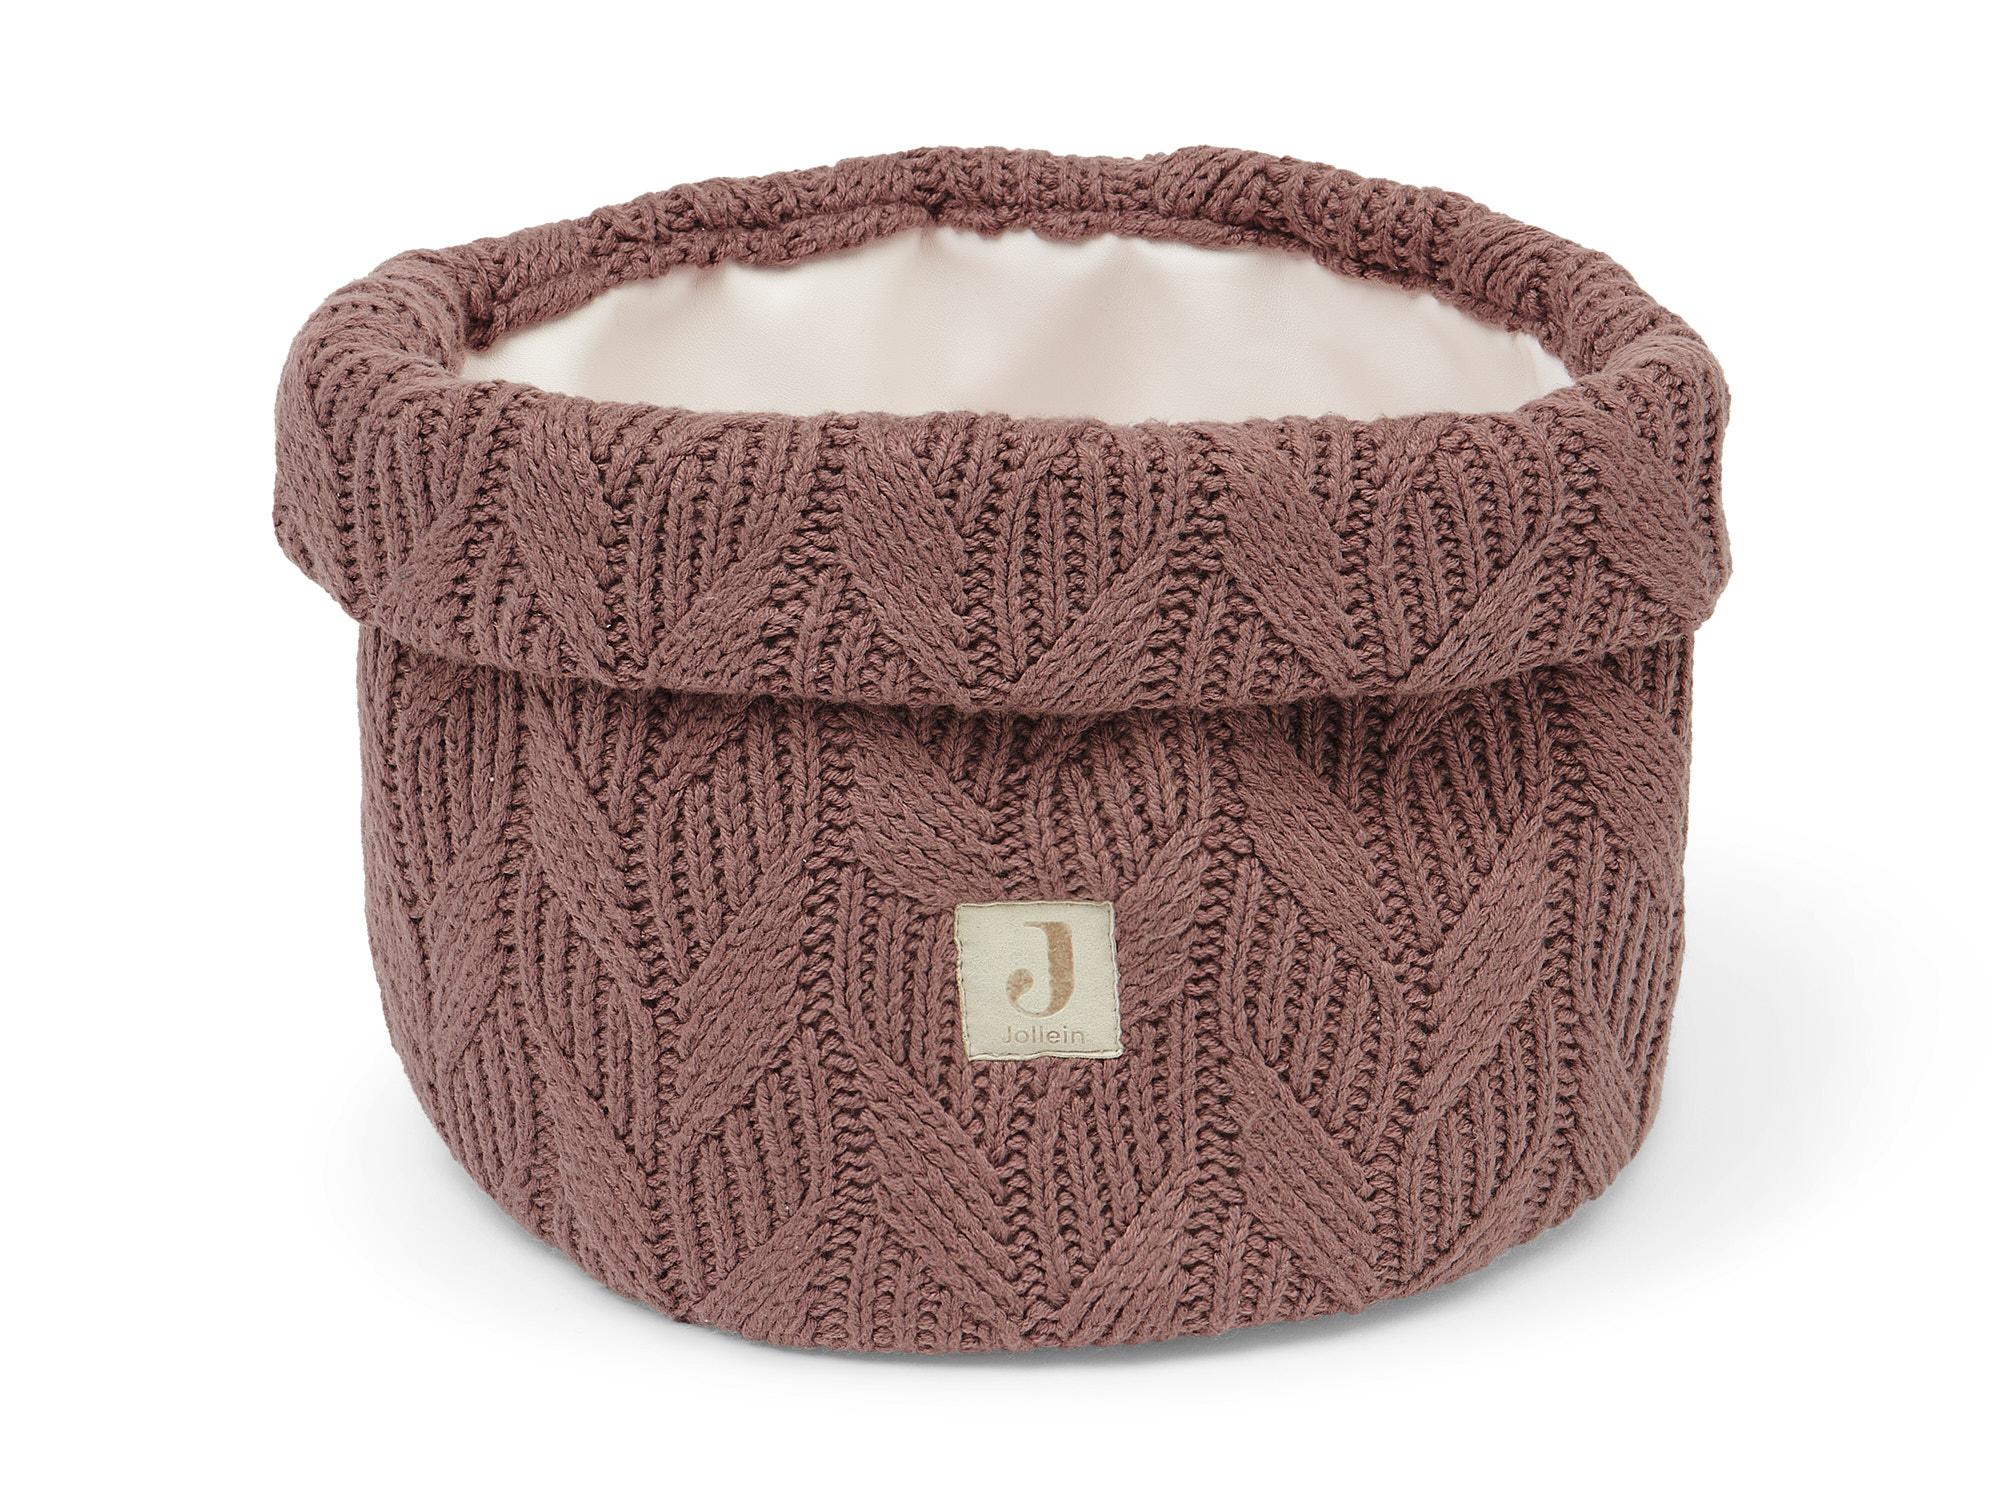 Afbeelding Jollein Commodemandje Spring Knit I Chestnut